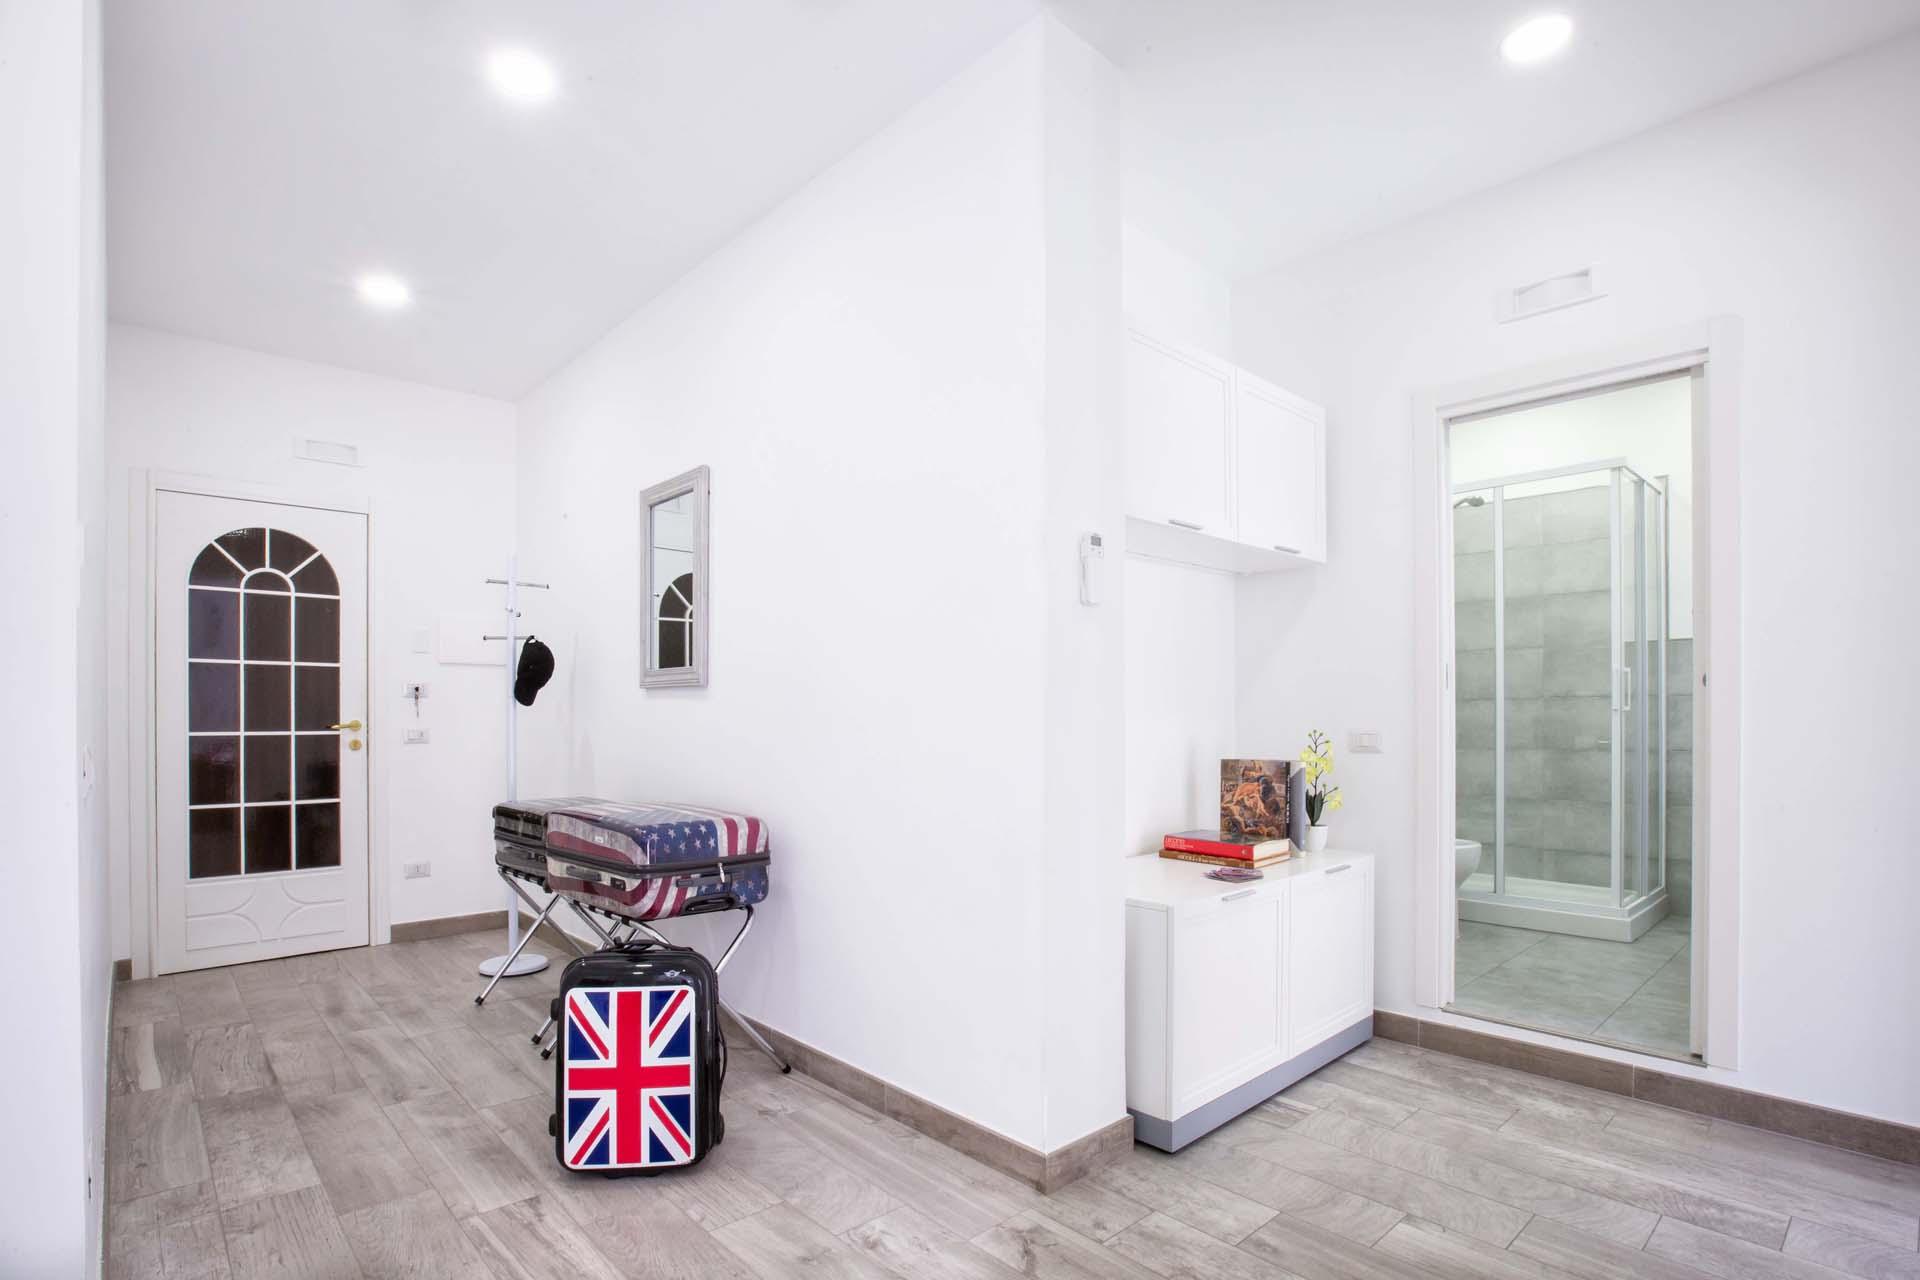 Conny's luxury maison living room